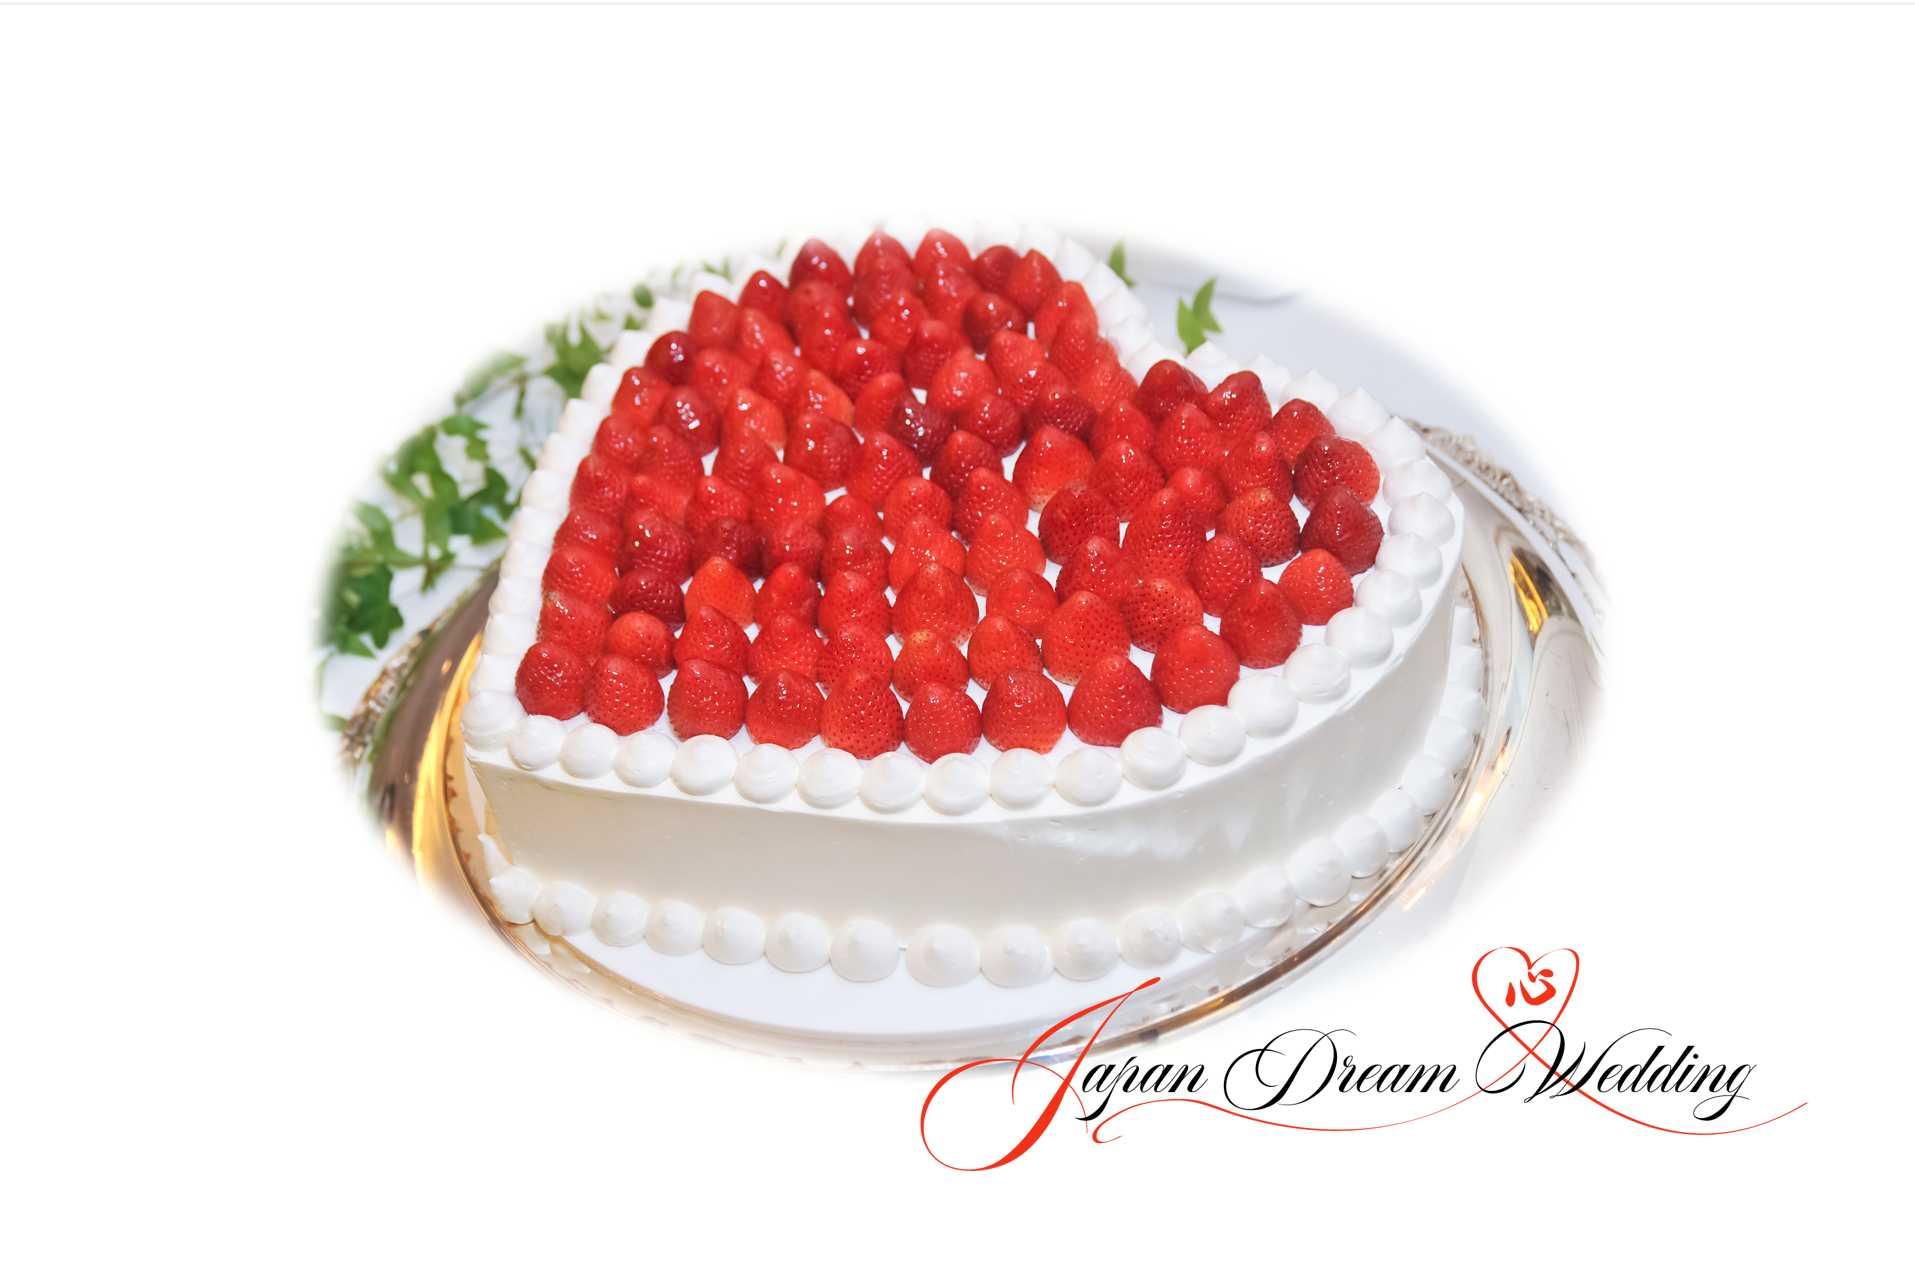 Japan Dream Wedding Cakes